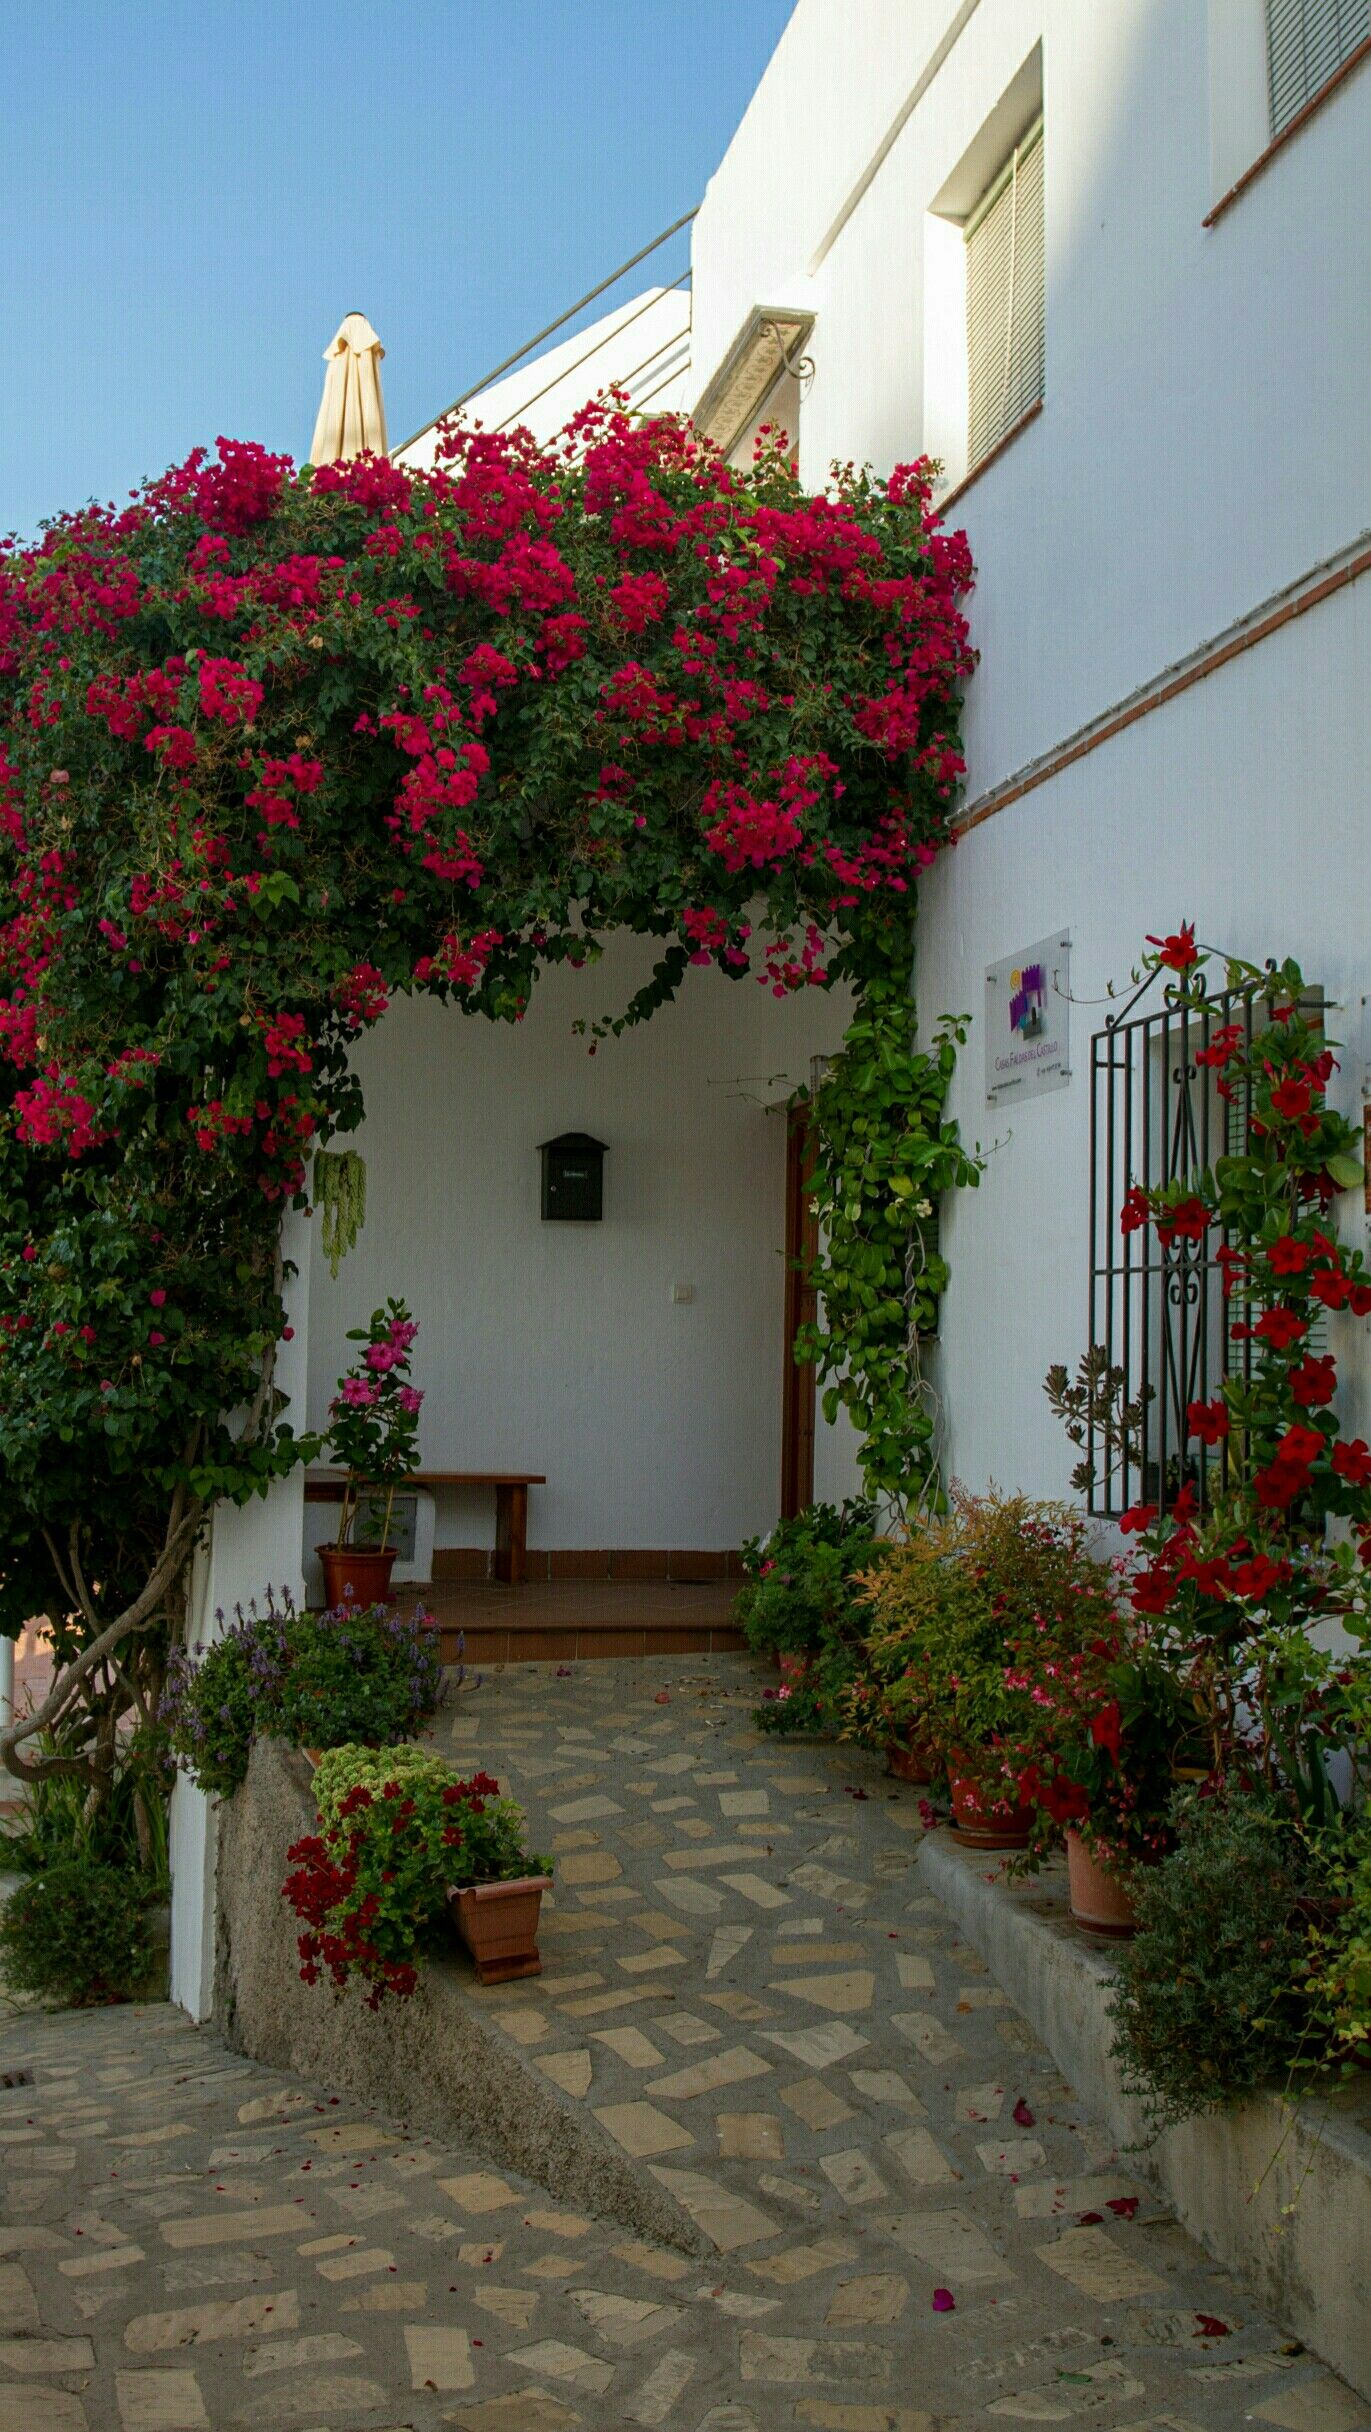 Pin de hafizur rahman en flower gates casas - Decoraciones de casas modernas ...